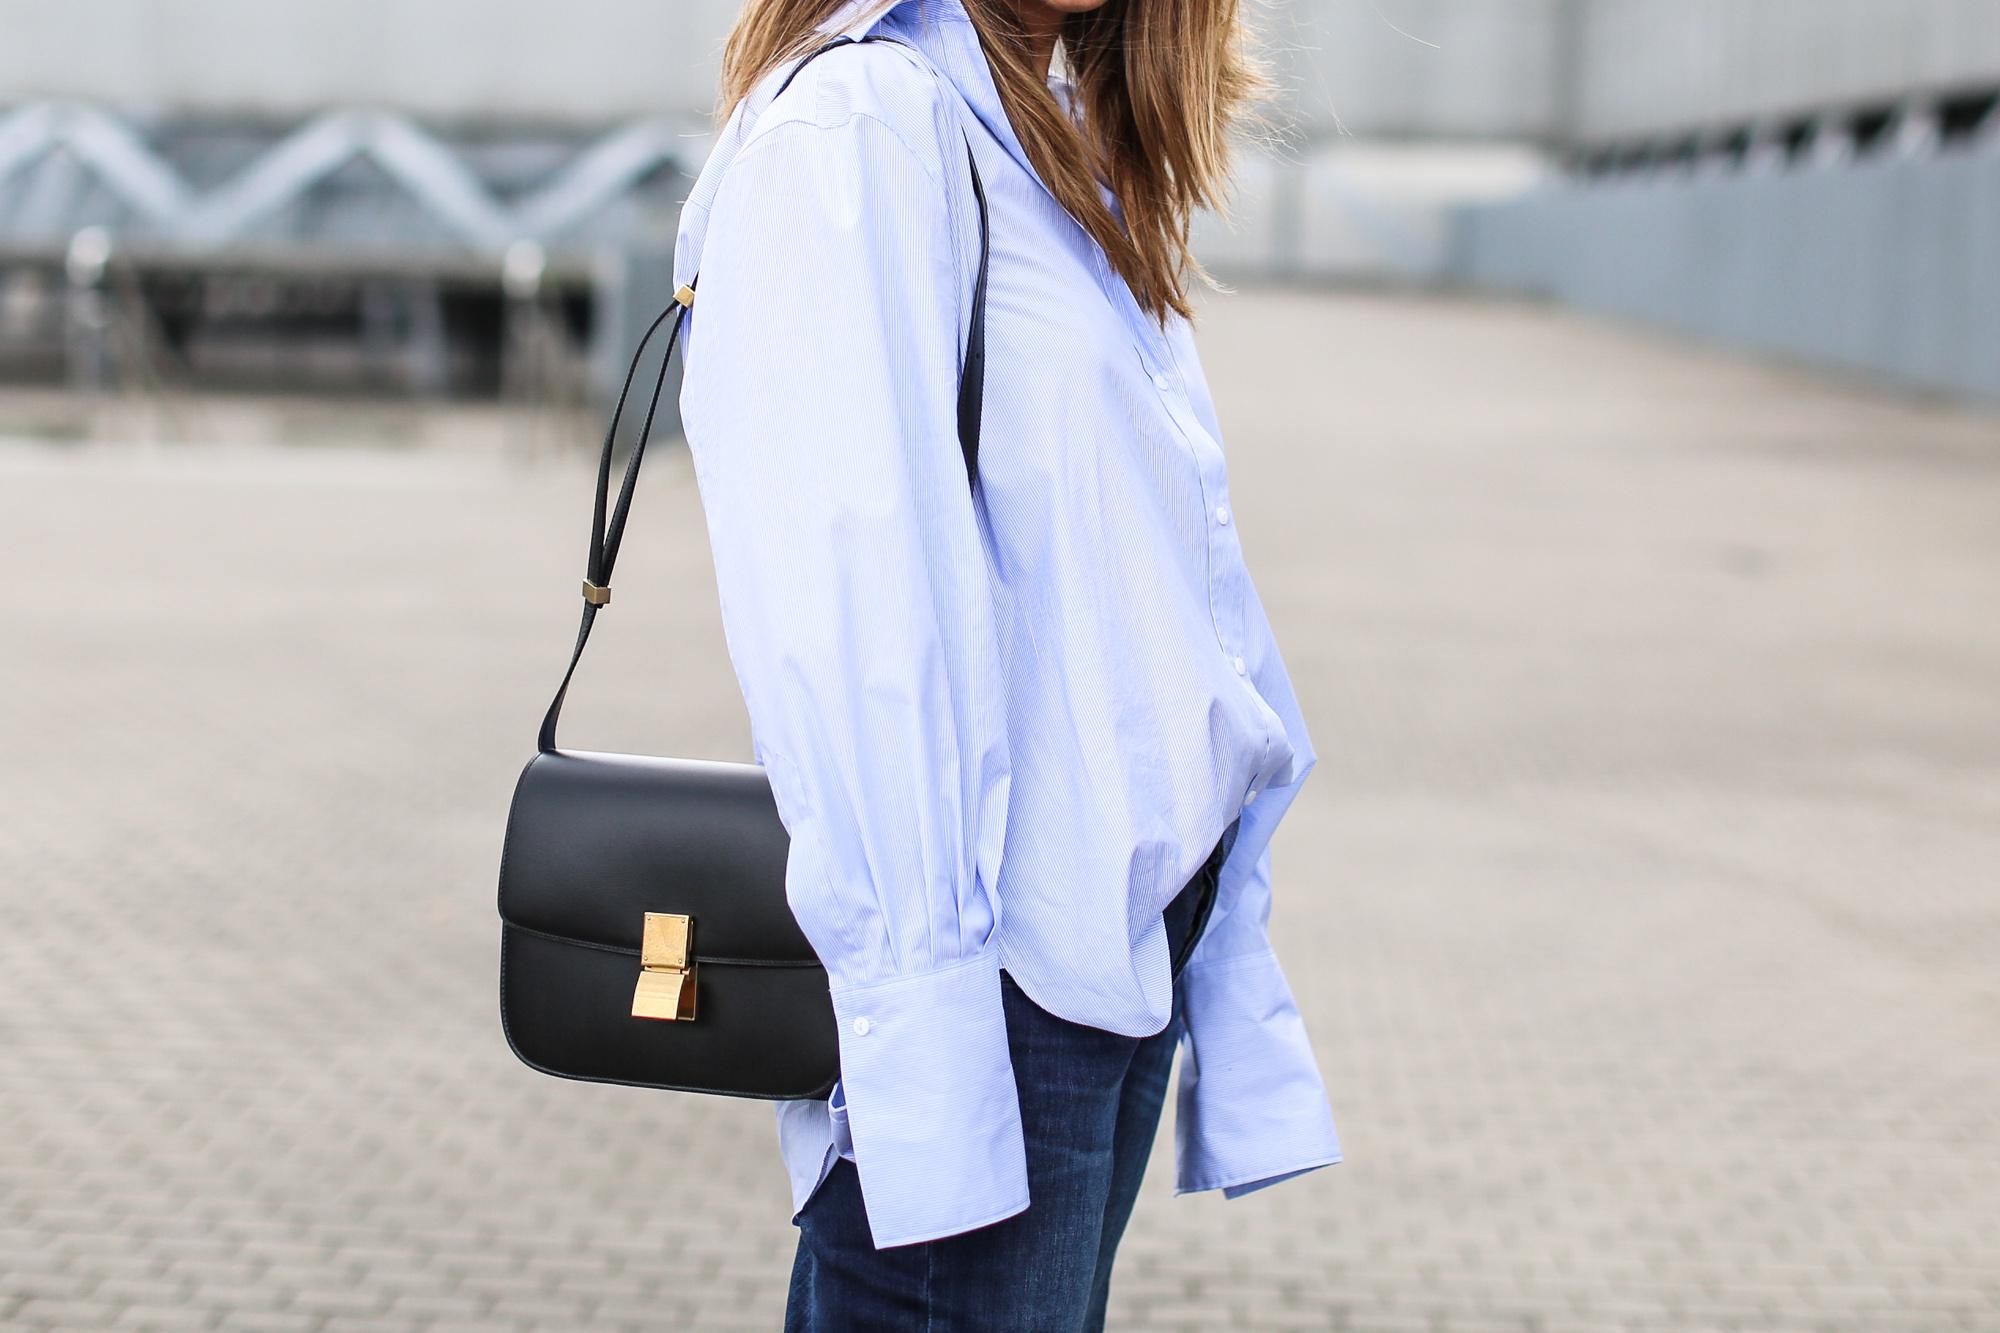 Clochet_fashionblogger_streetstyle_distressedboyfriendjeans_celineparisboxbag-5